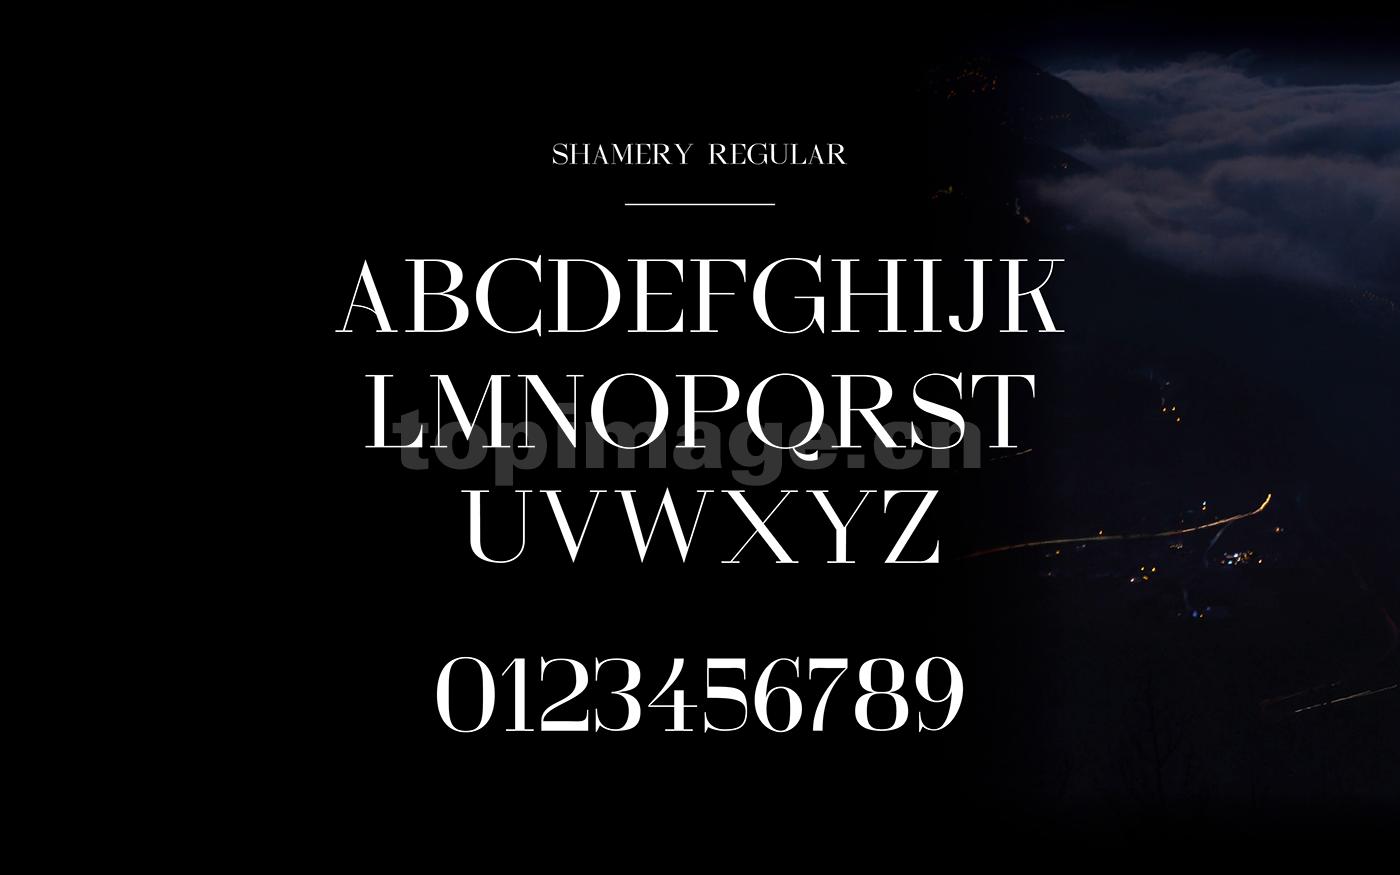 shamery秀气衬线纤细英文字体下载